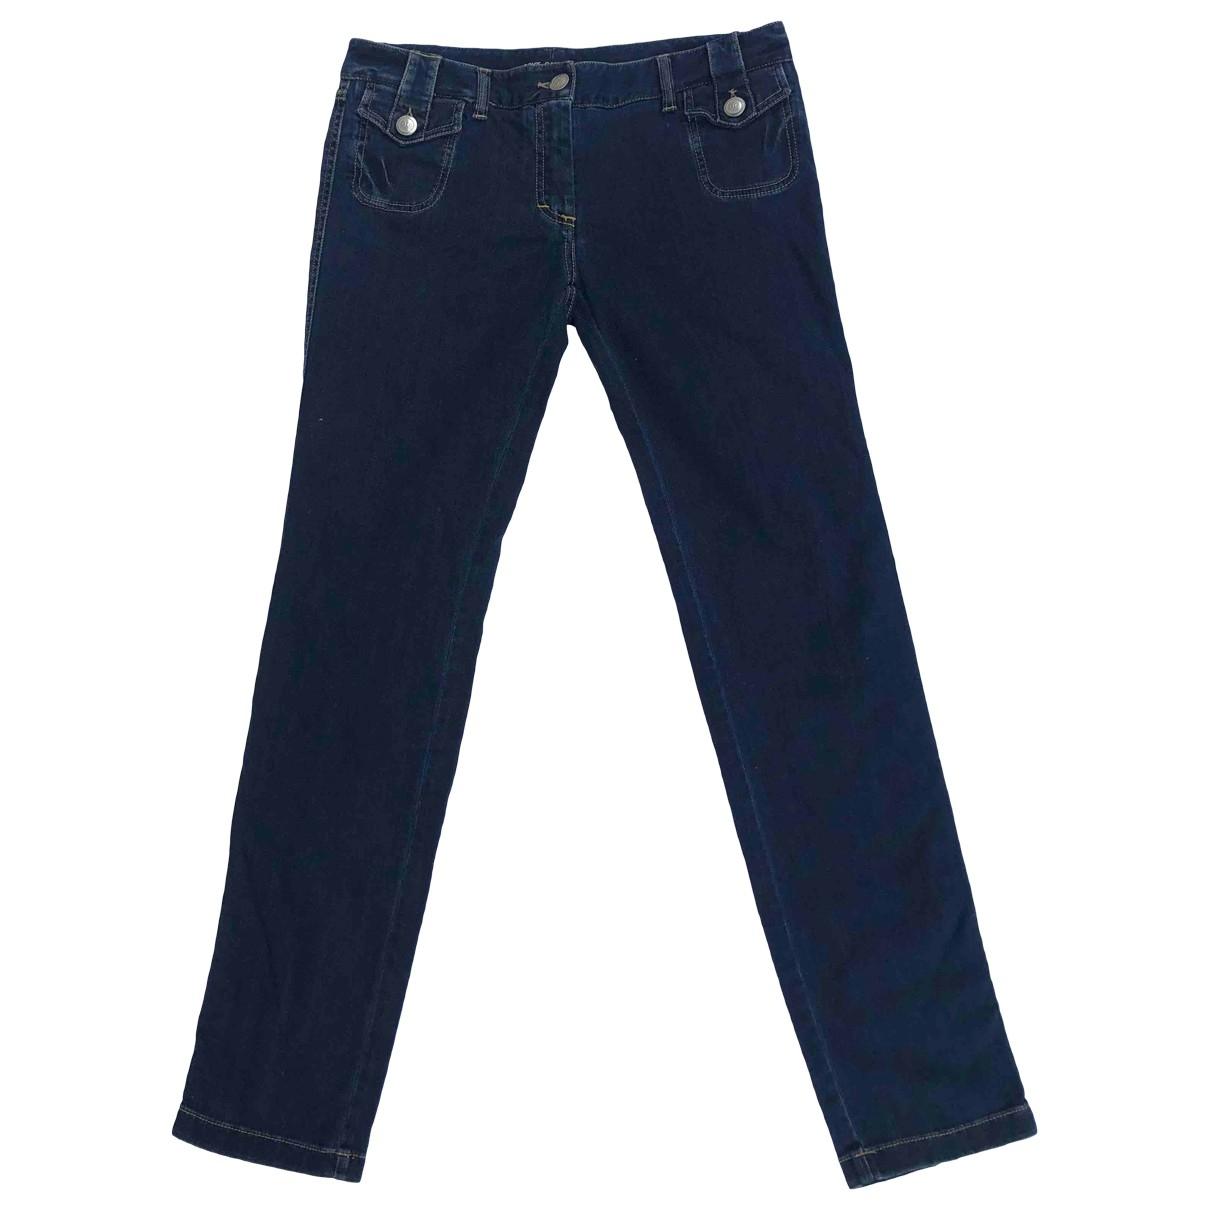 Dolce & Gabbana \N Blue Cotton - elasthane Jeans for Women 38 FR